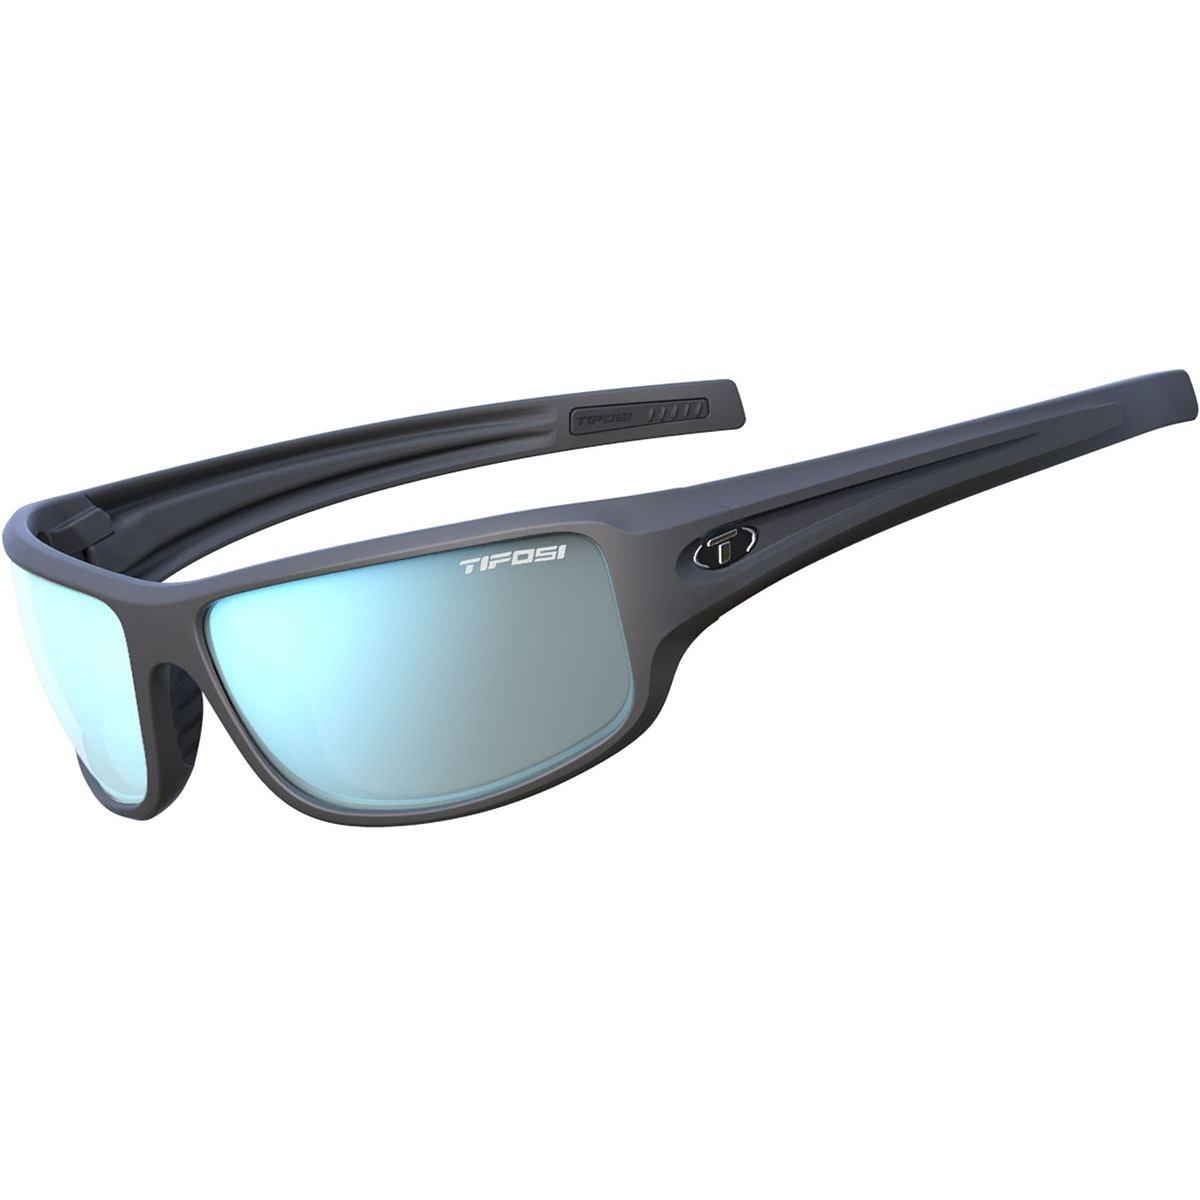 Tifosi Optics Bronx Sunglasses